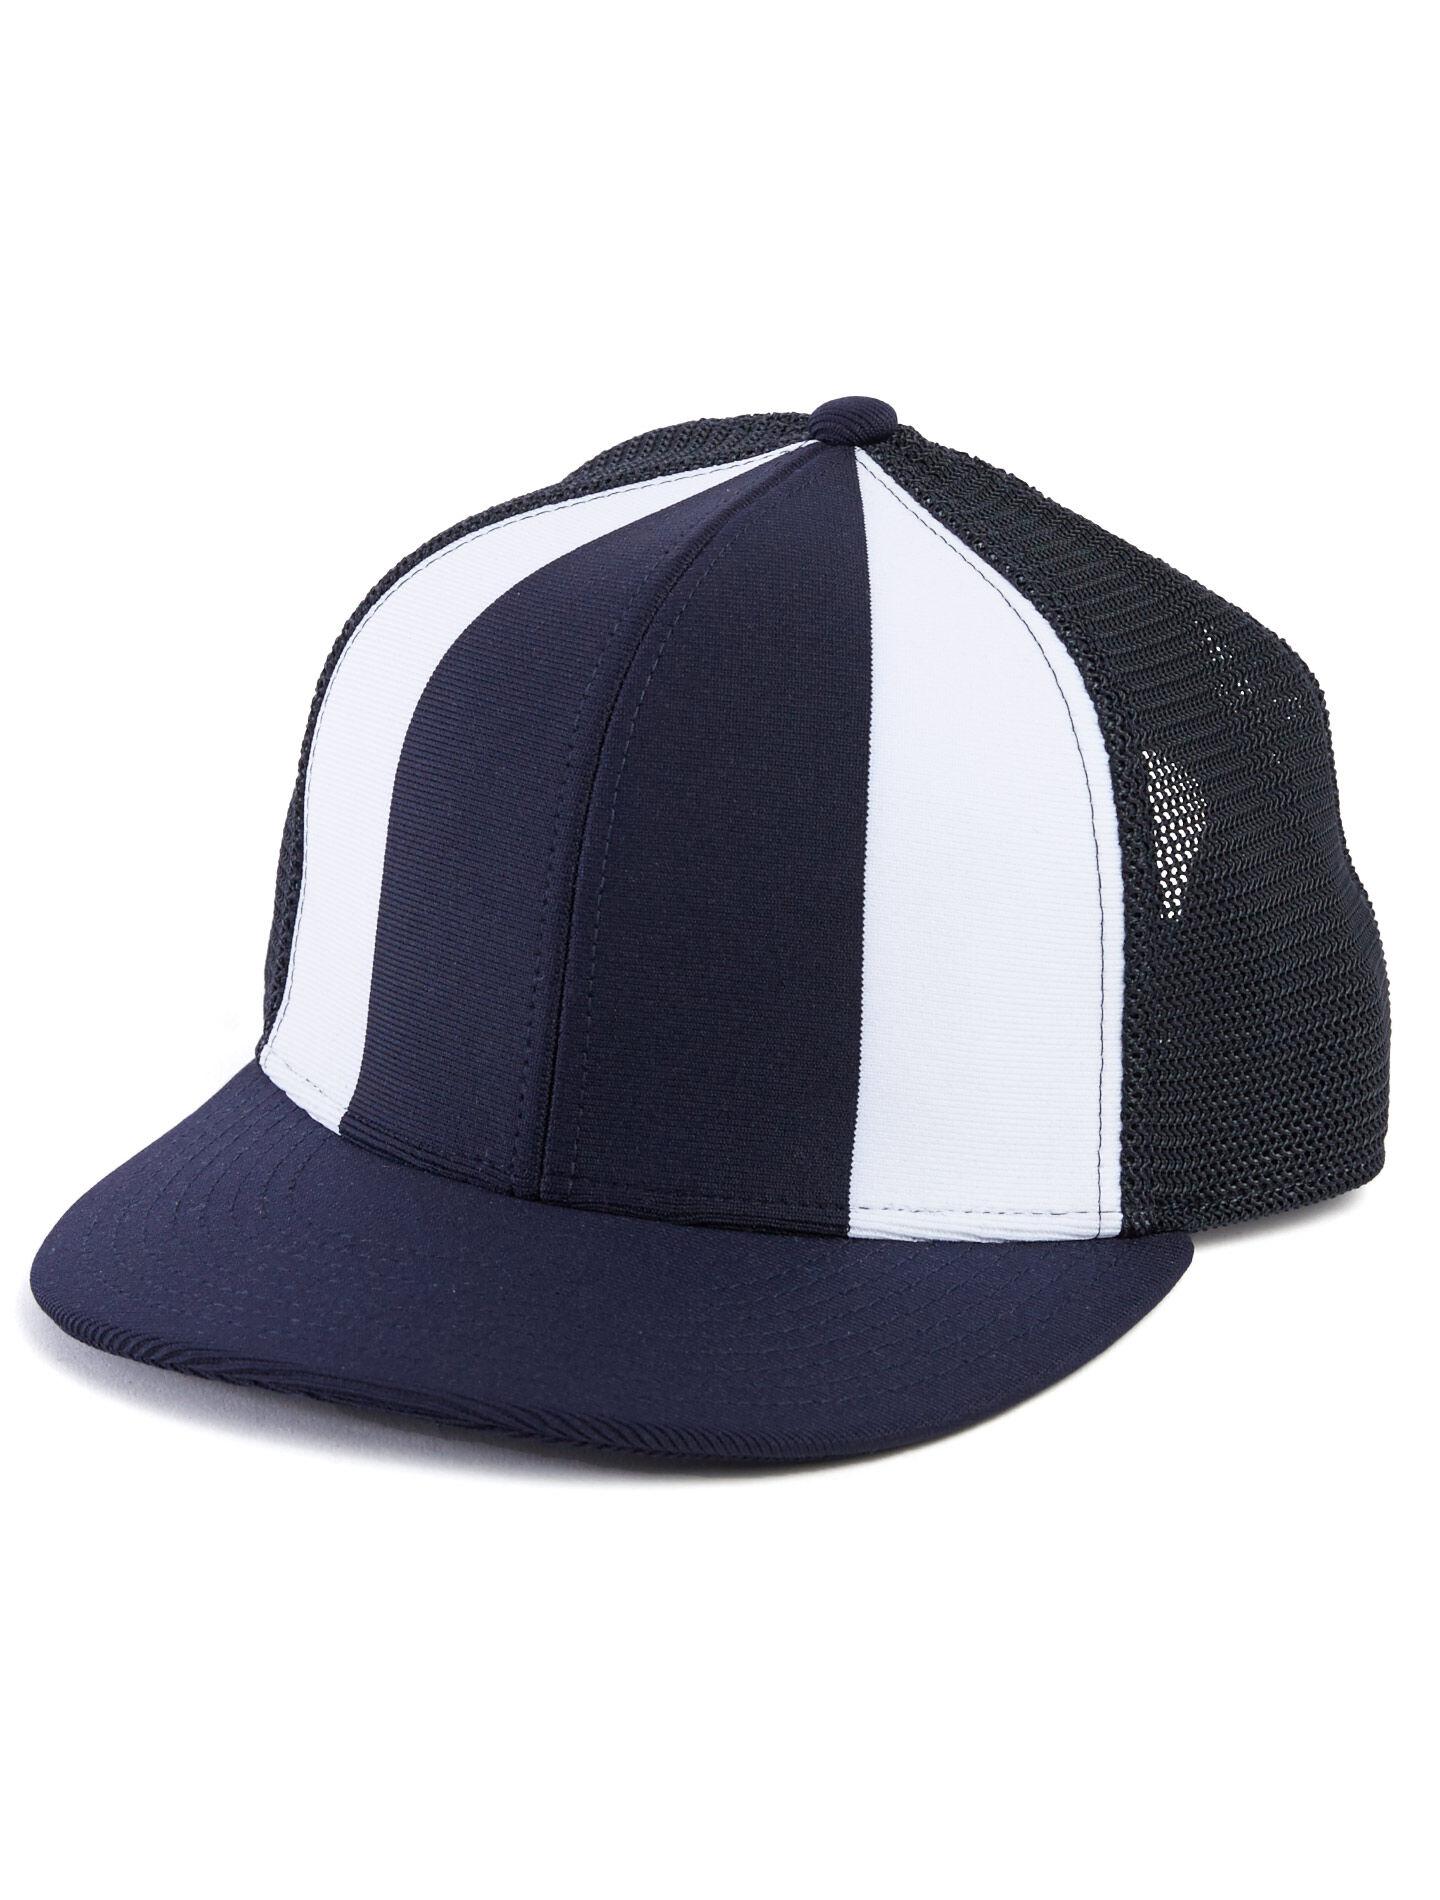 Alternative Apparel The Fenway Ball Cap - Navy & White - Size: OS